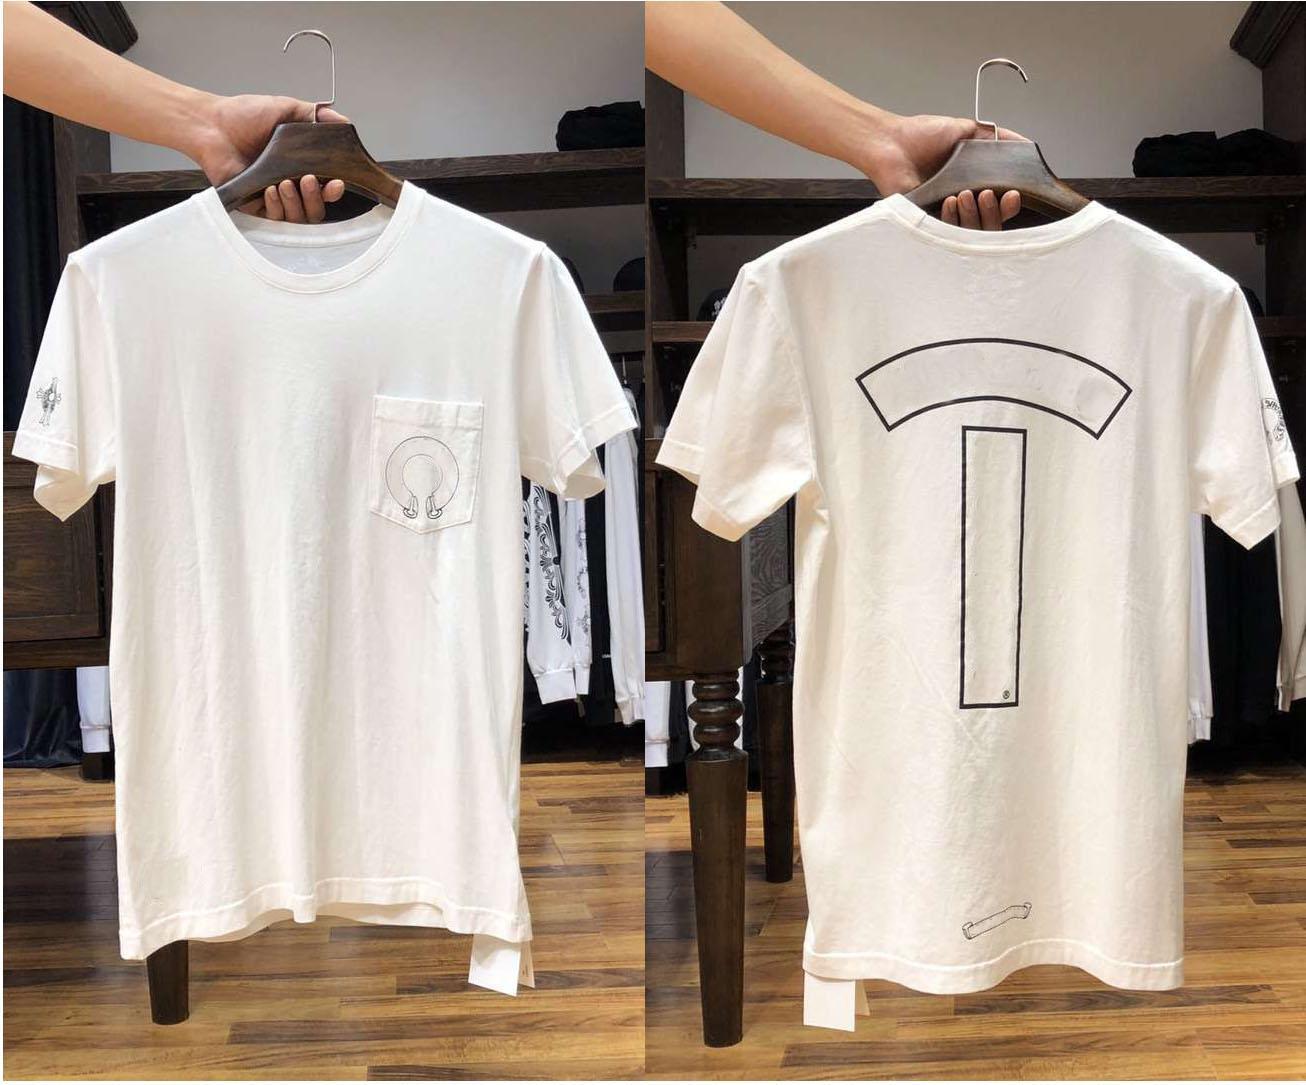 Klassische Kurzarm Casual T-shirt Hohe Qualität Sommer Brief Muster Gedruckt Baumwolle Herren Frau T-Shirts 16 Arten